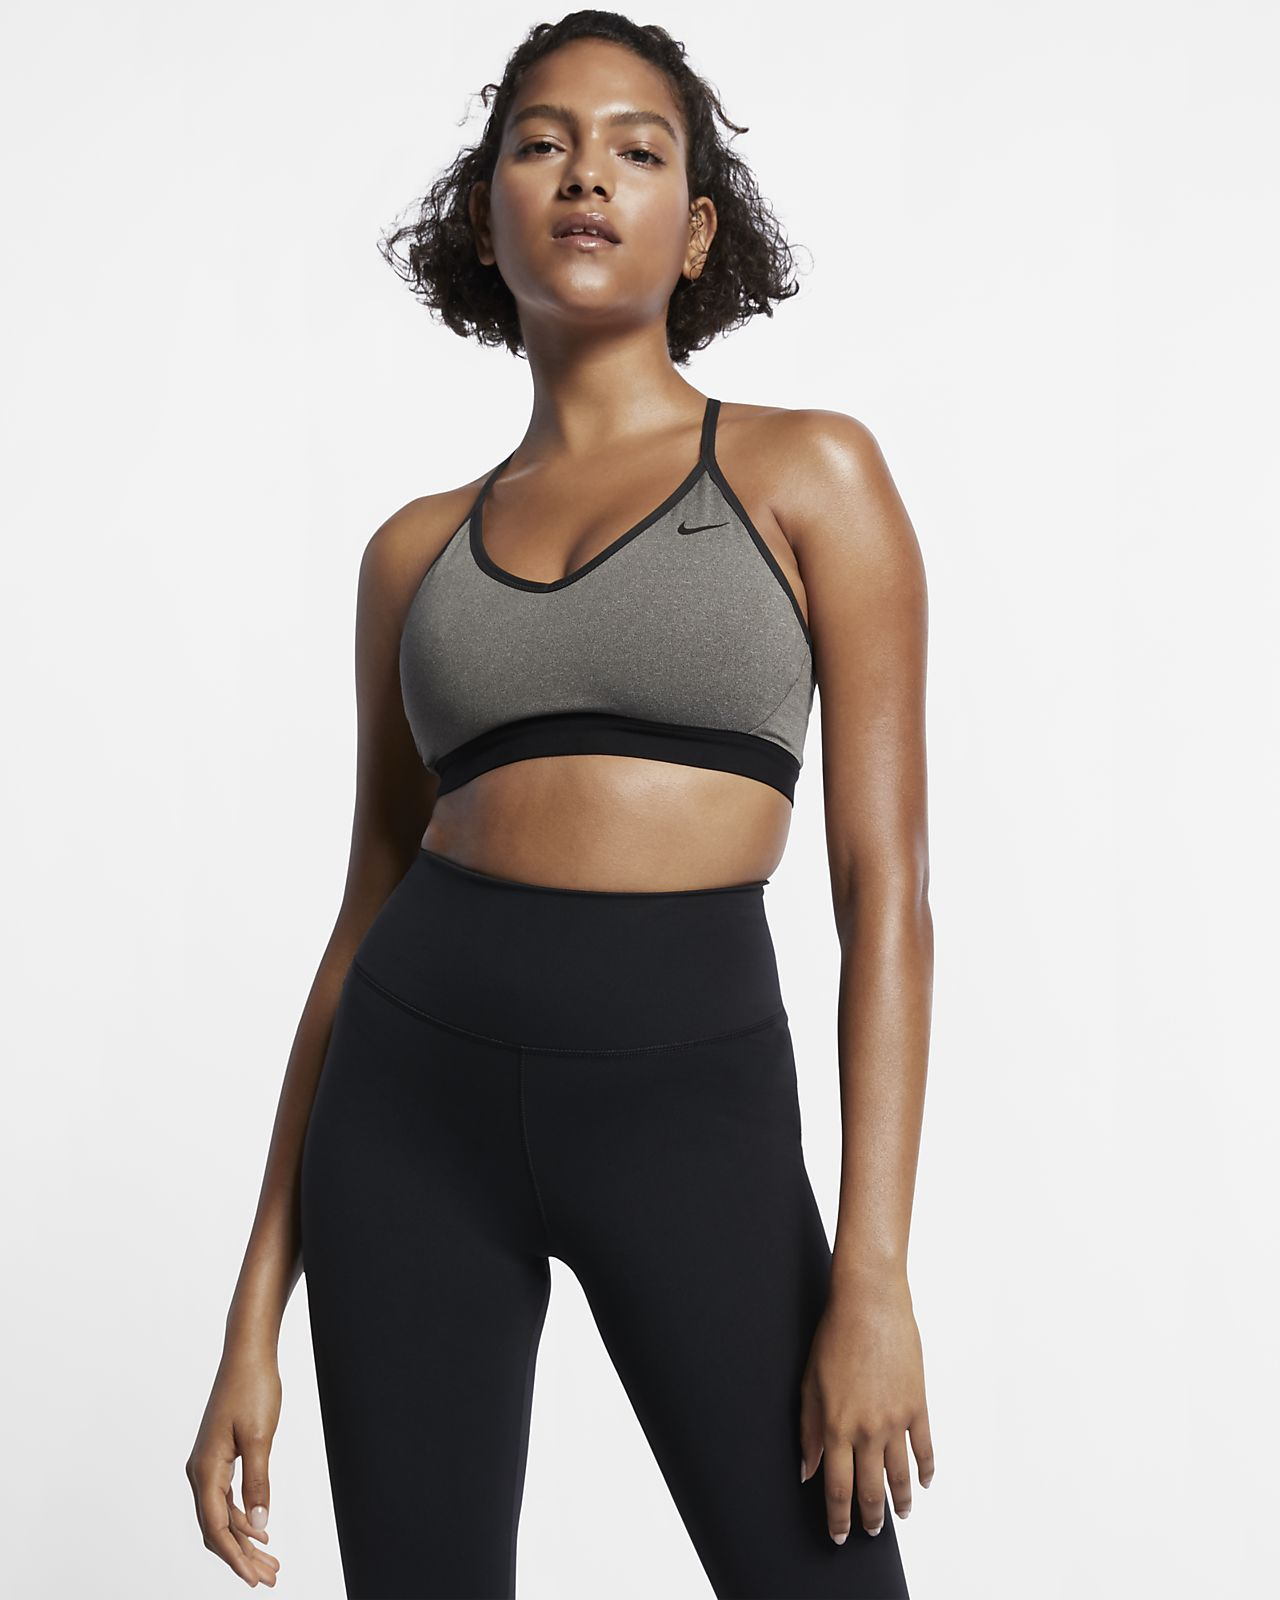 2a8736012a2b9 Nike indy women light support sports bra jpg 1280x1600 Nike sports crop top